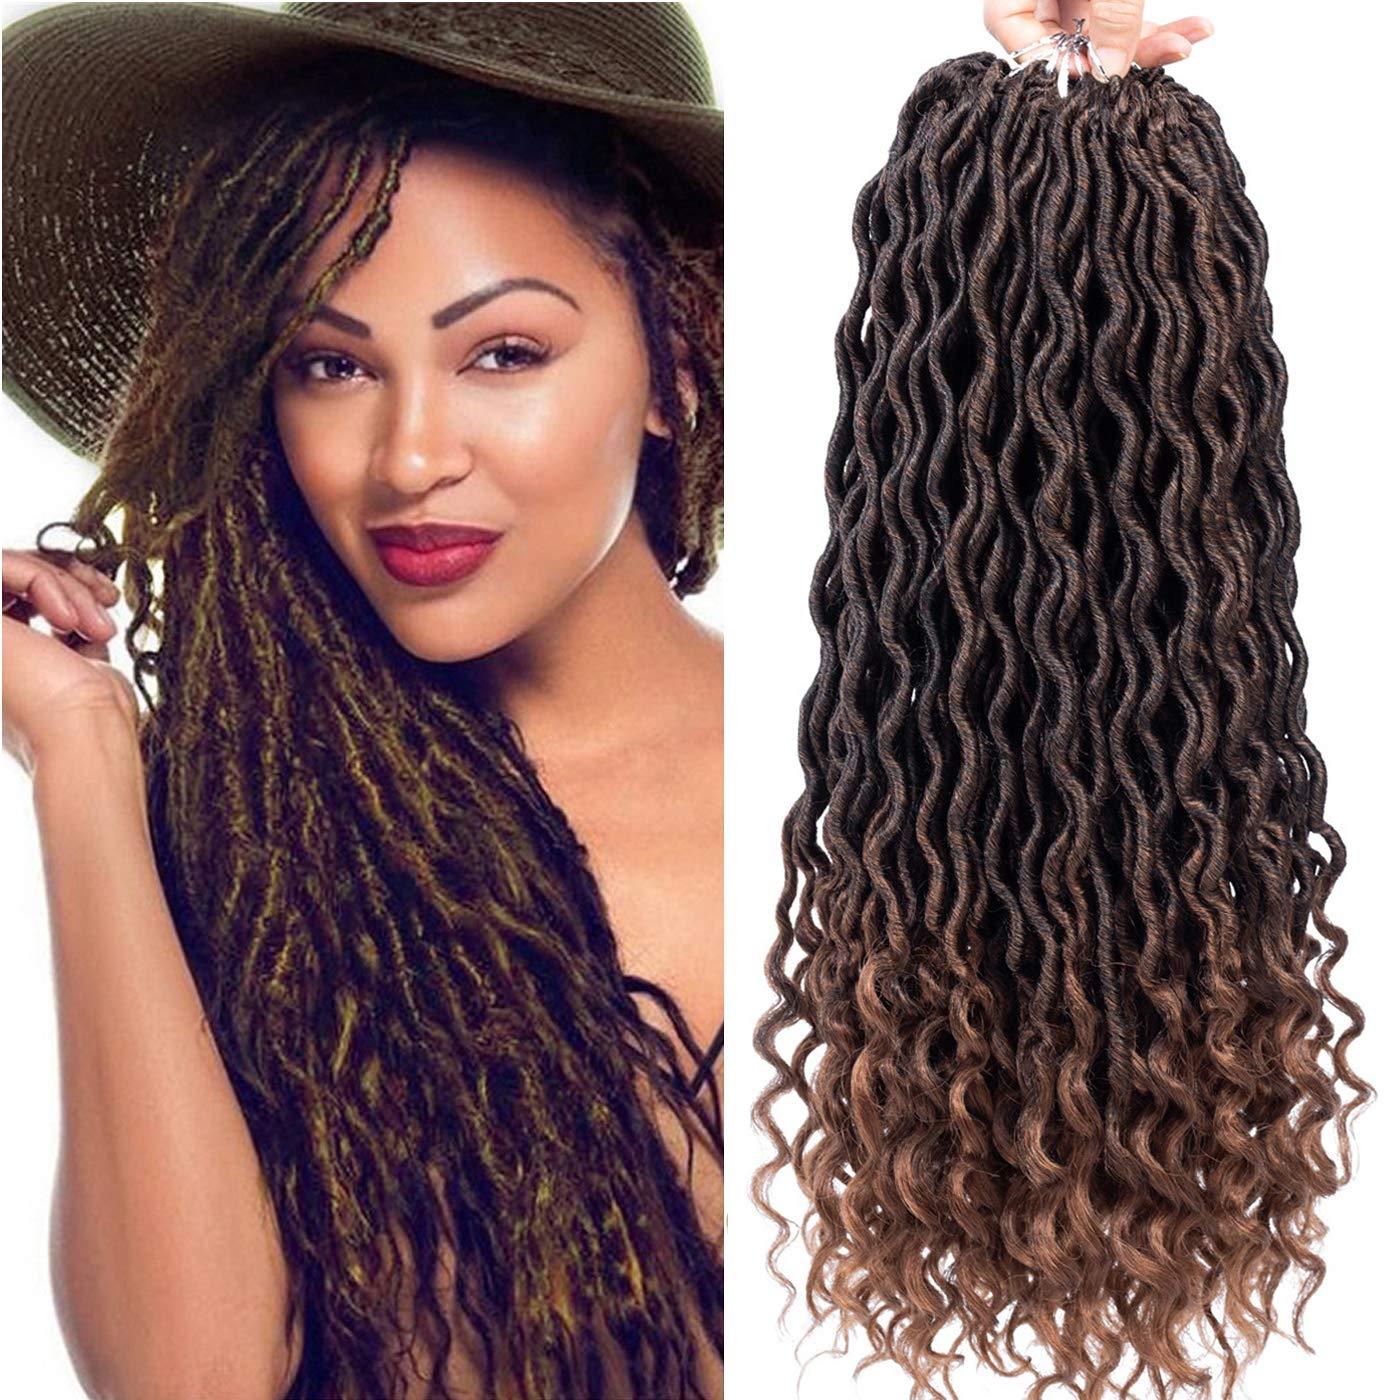 Karida 6Pcs/Lot Curly Faux Locs Crochet Hair Deep Wave Braiding Hair With Curly Ends Crochet Goddess Locs Synthetic Braids Hair Extensions (18inch, T1B/30#) by Karida